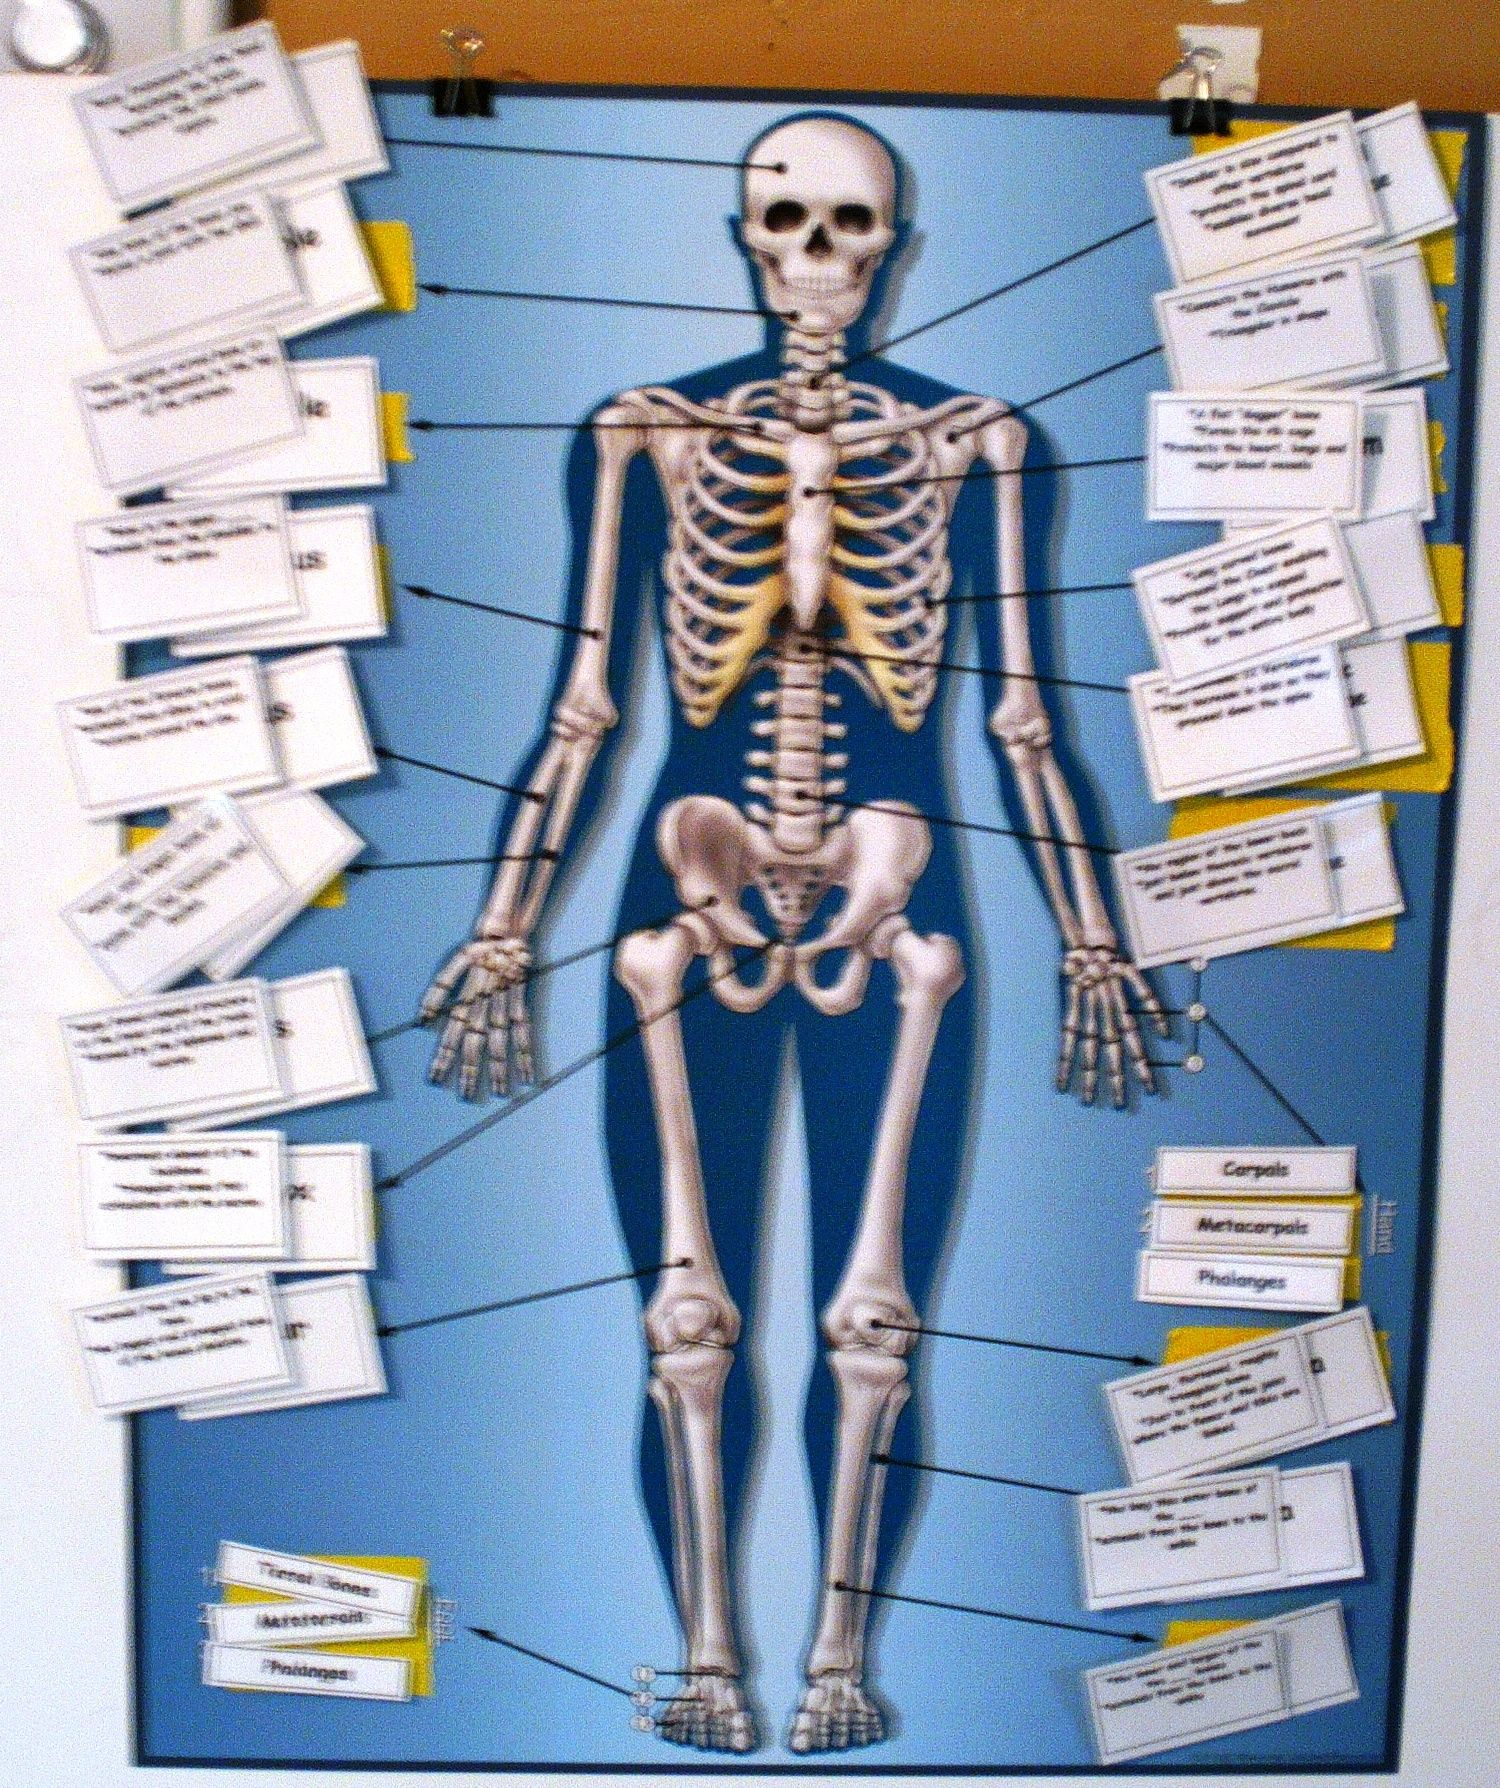 Skeletal Poster Altered With Manipulatives